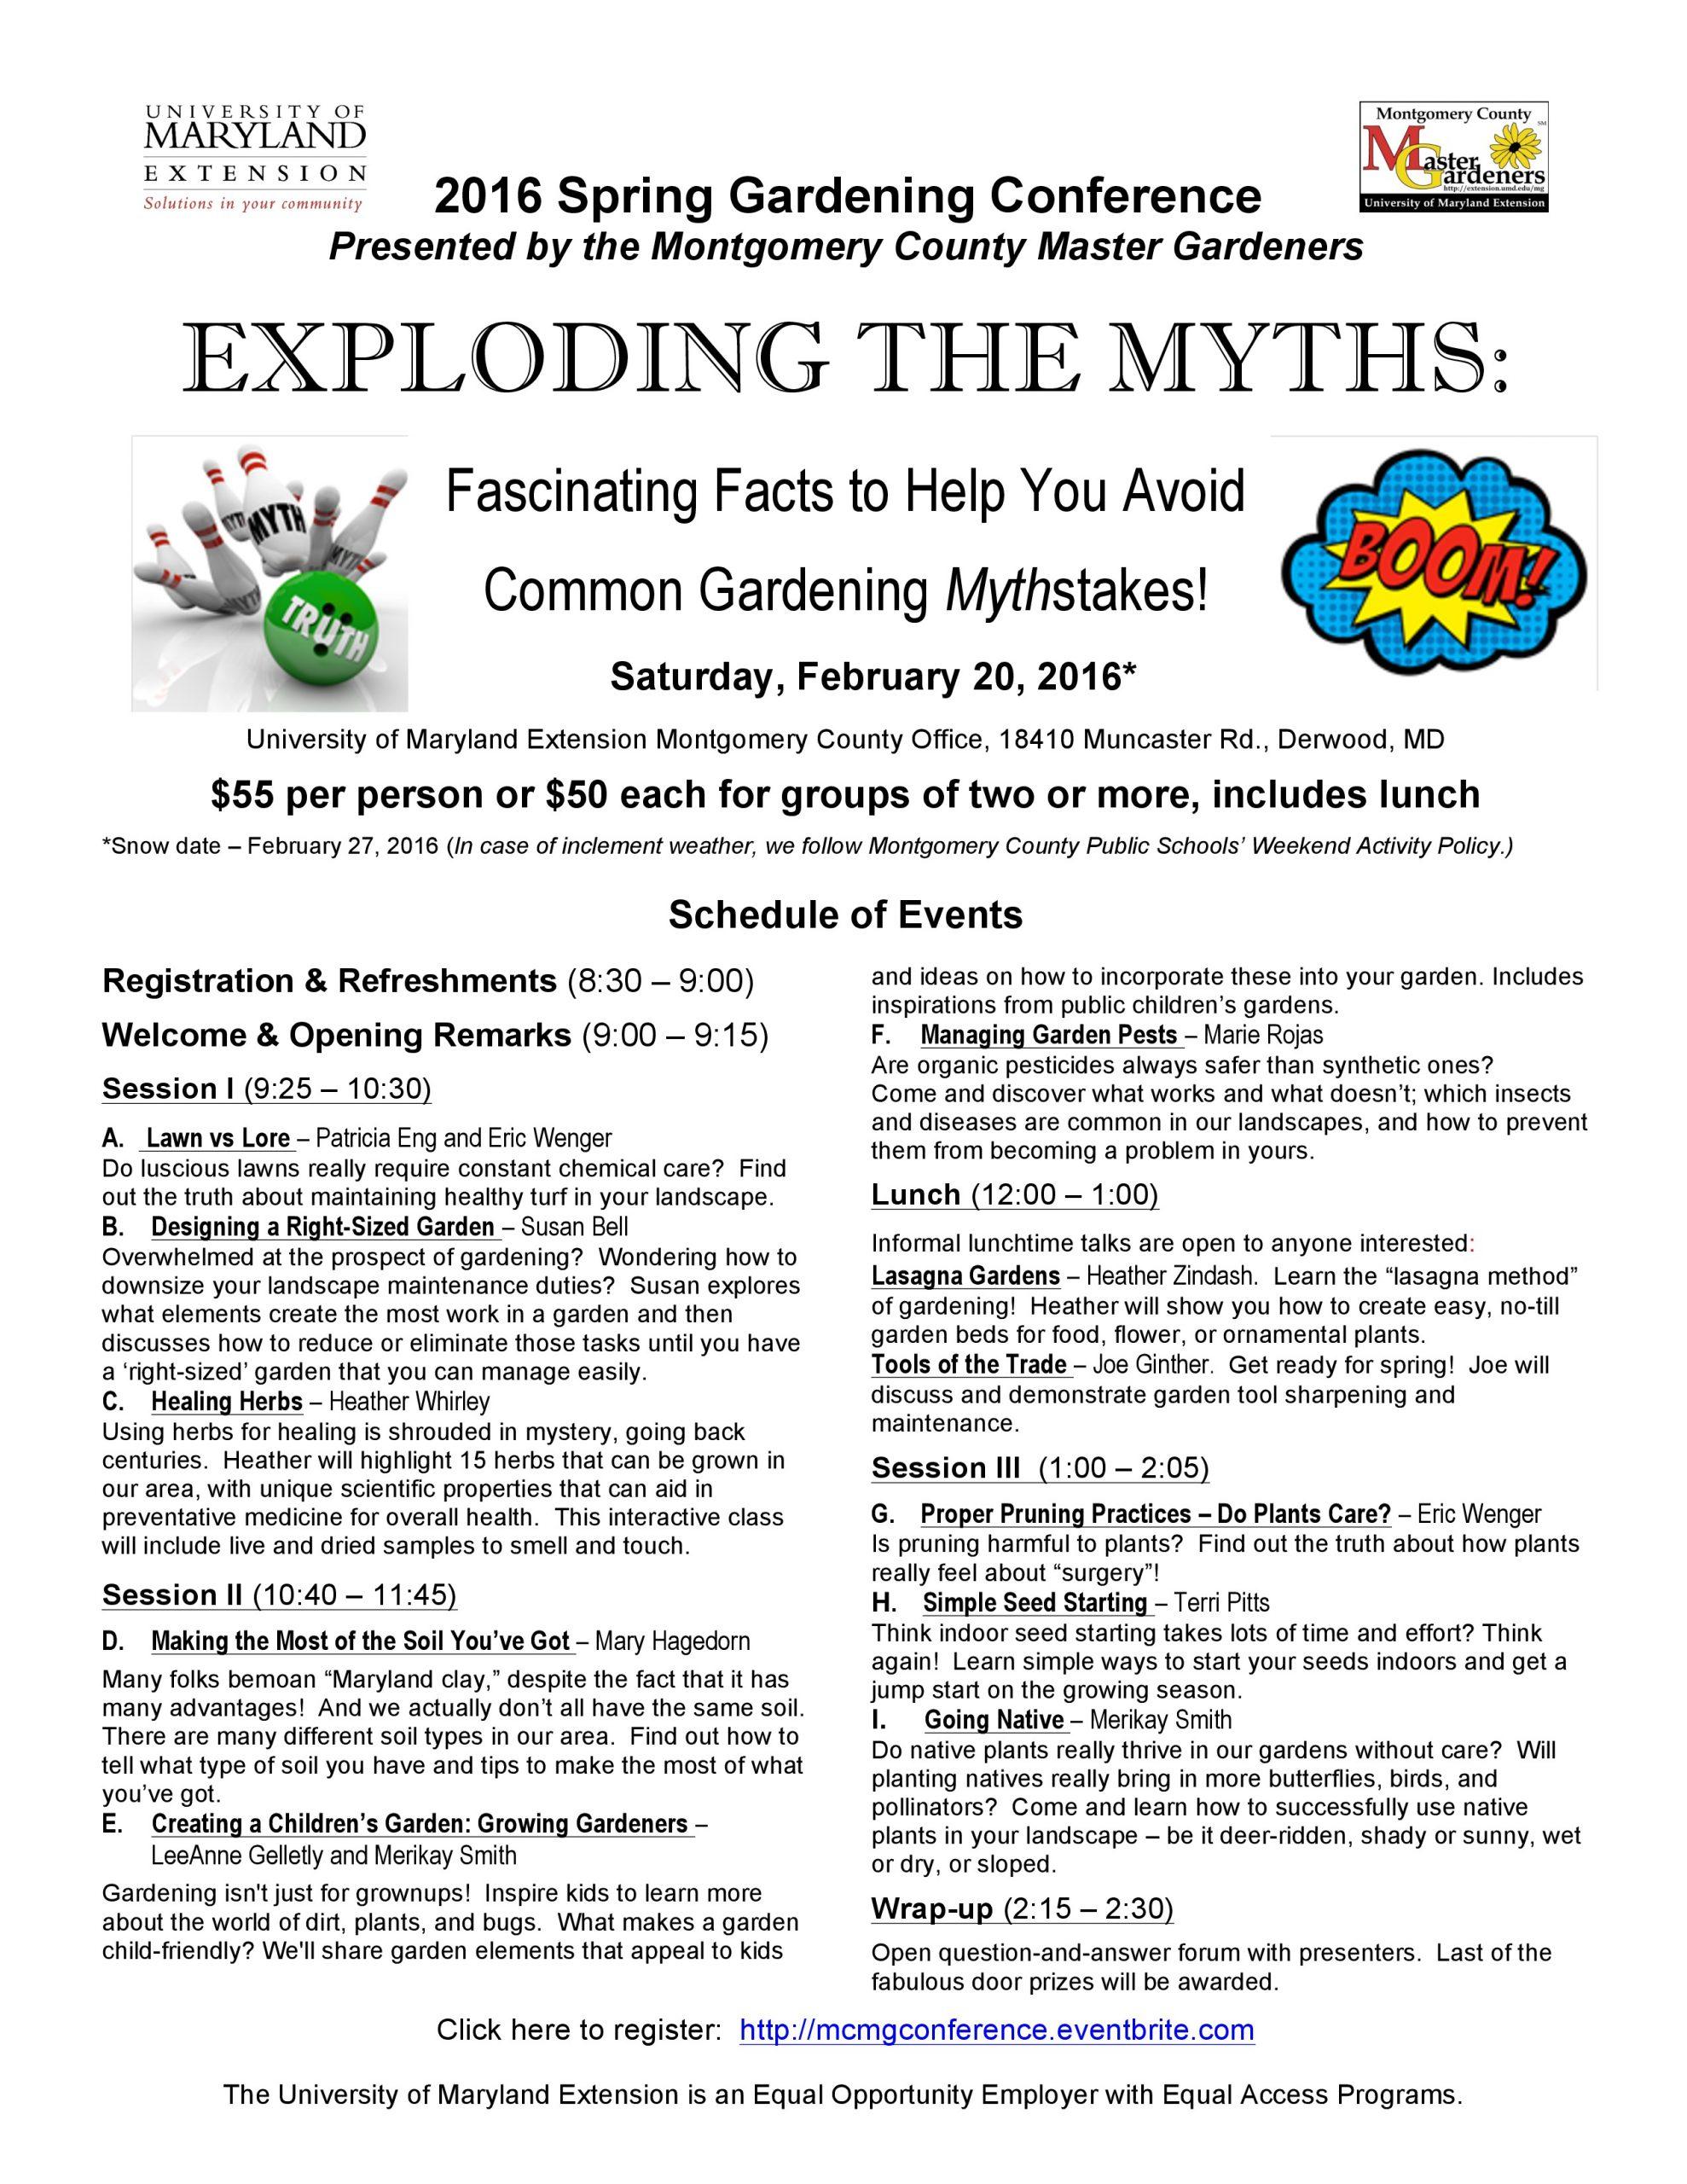 spring gardening conference